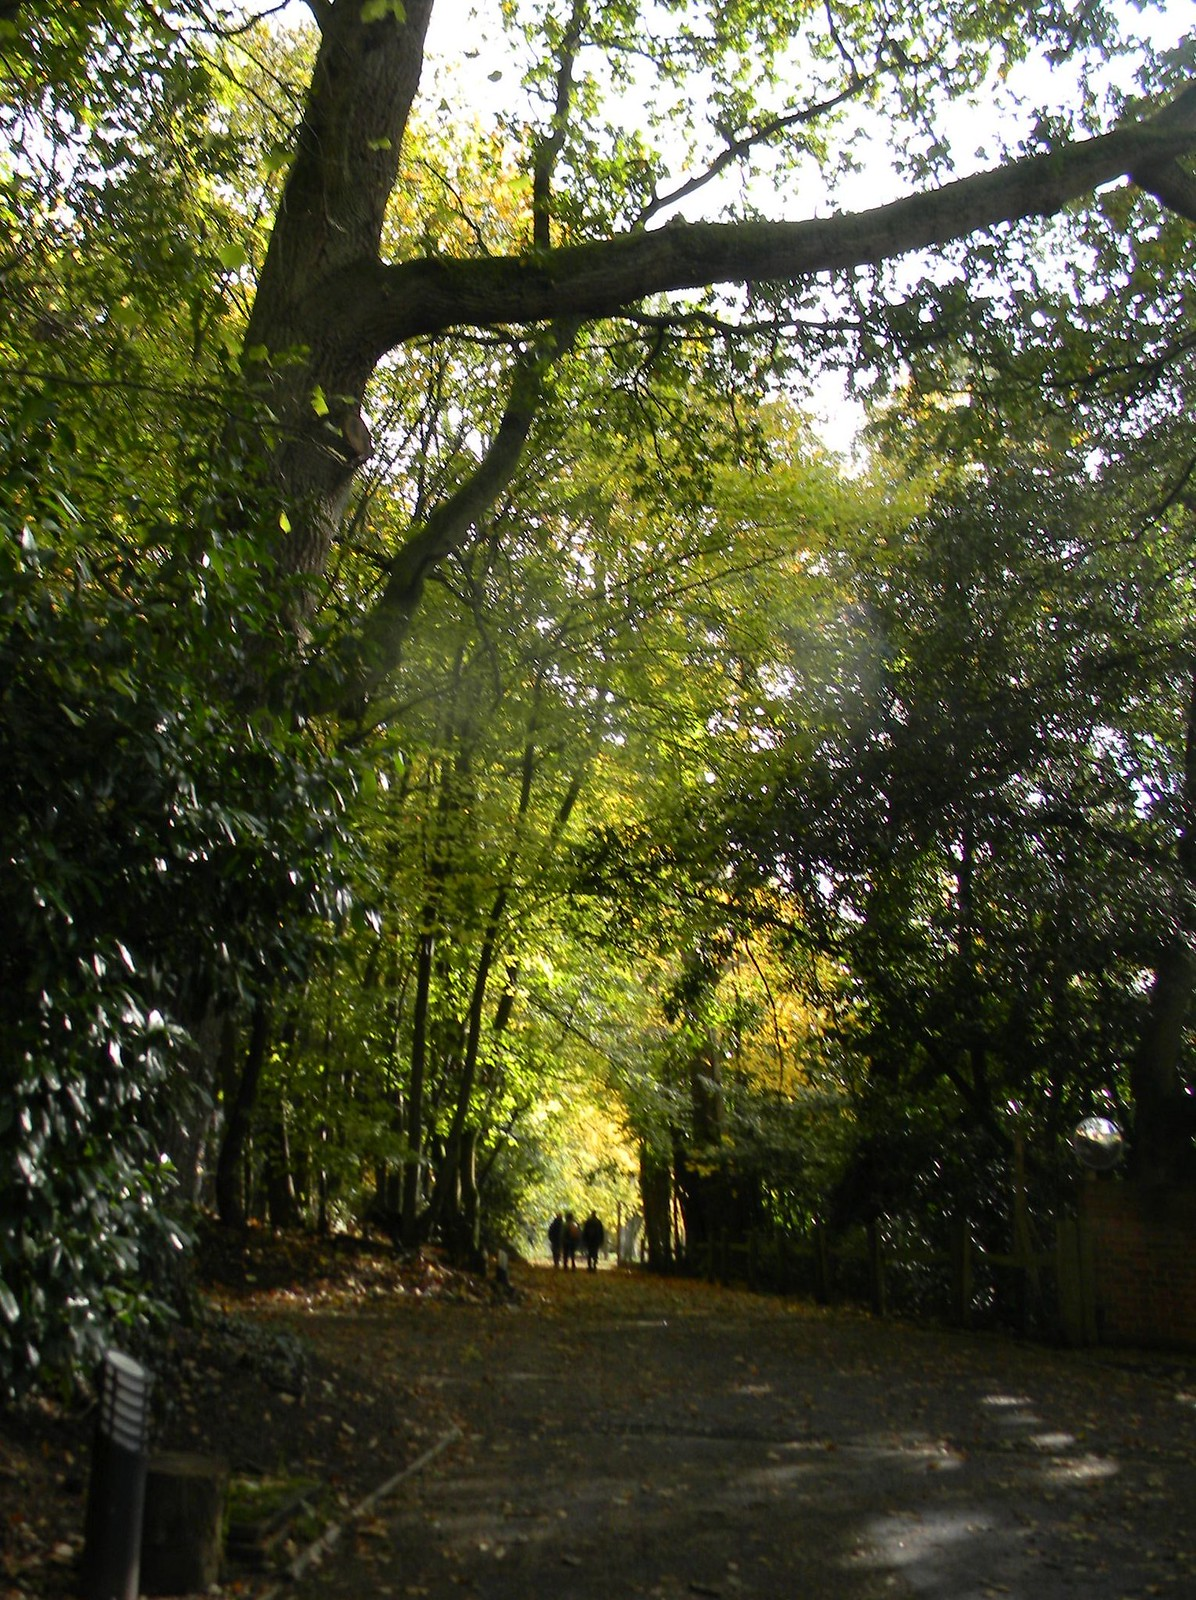 disappearing walkers Farnham to Godalming Wednesday Walk